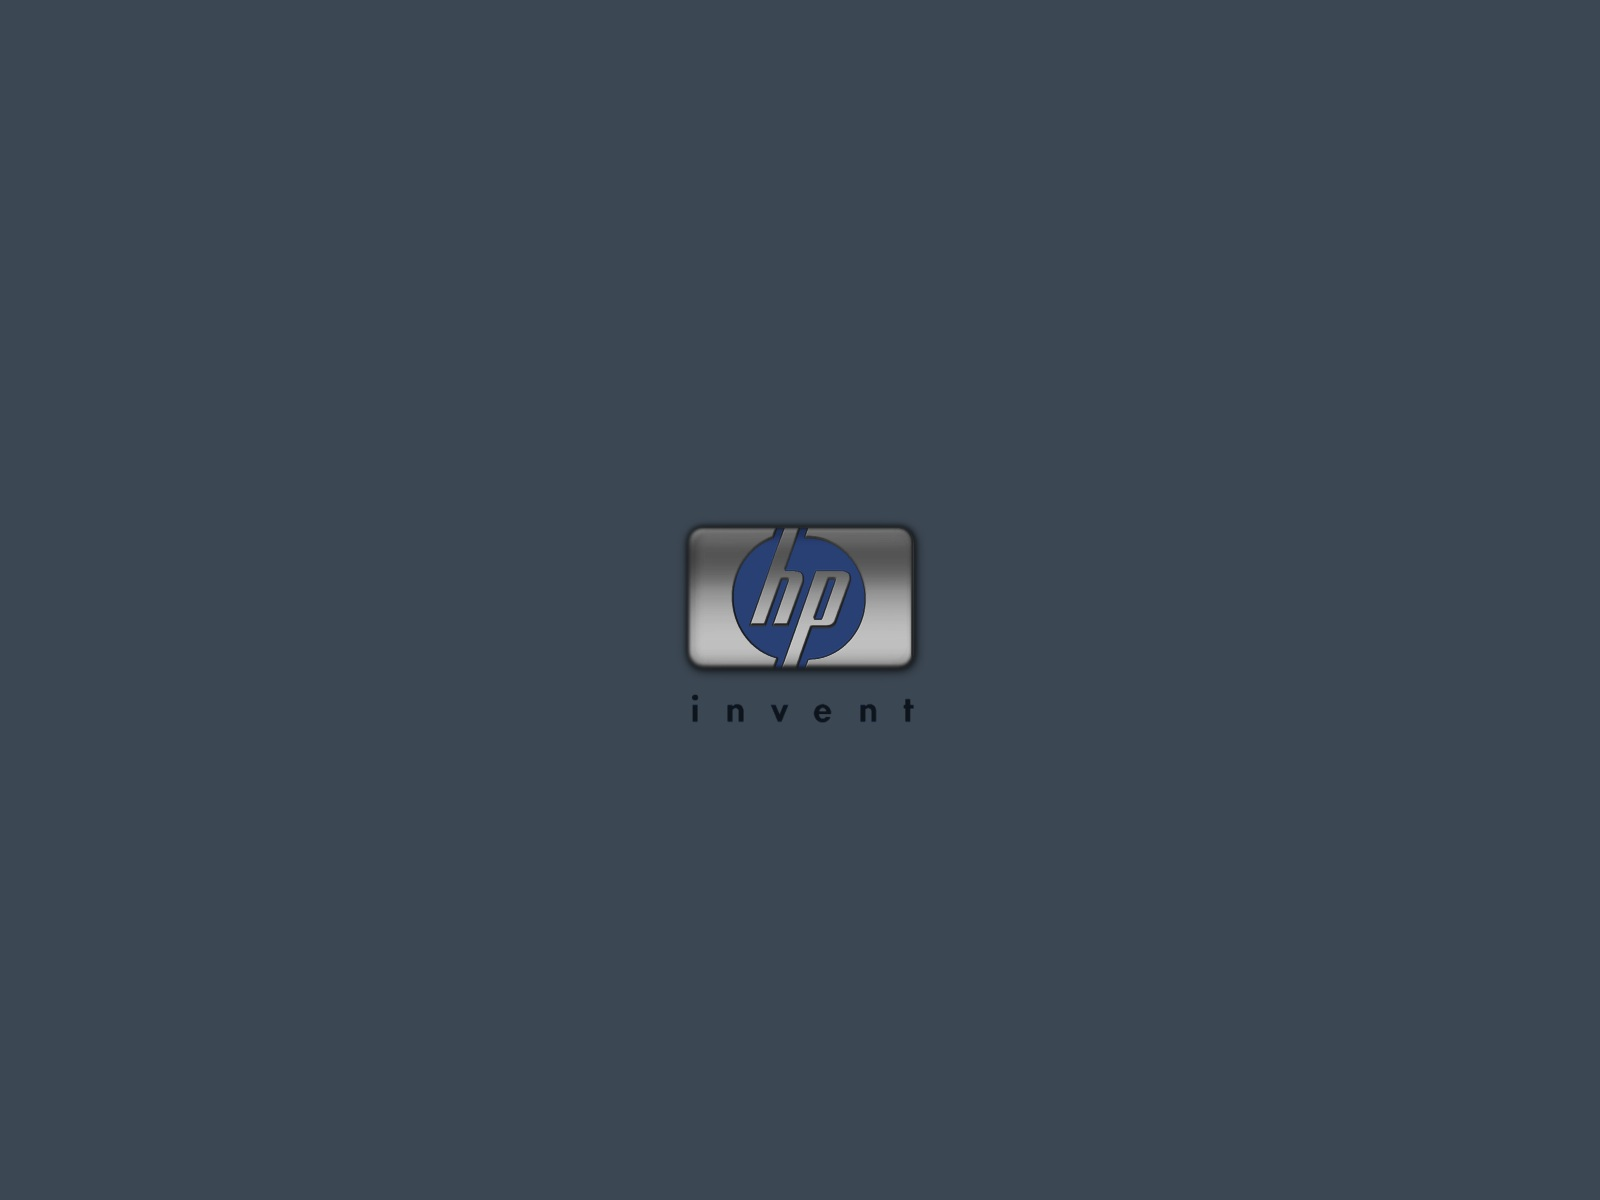 Your Wallpaper: Computer Brands Wallpaper